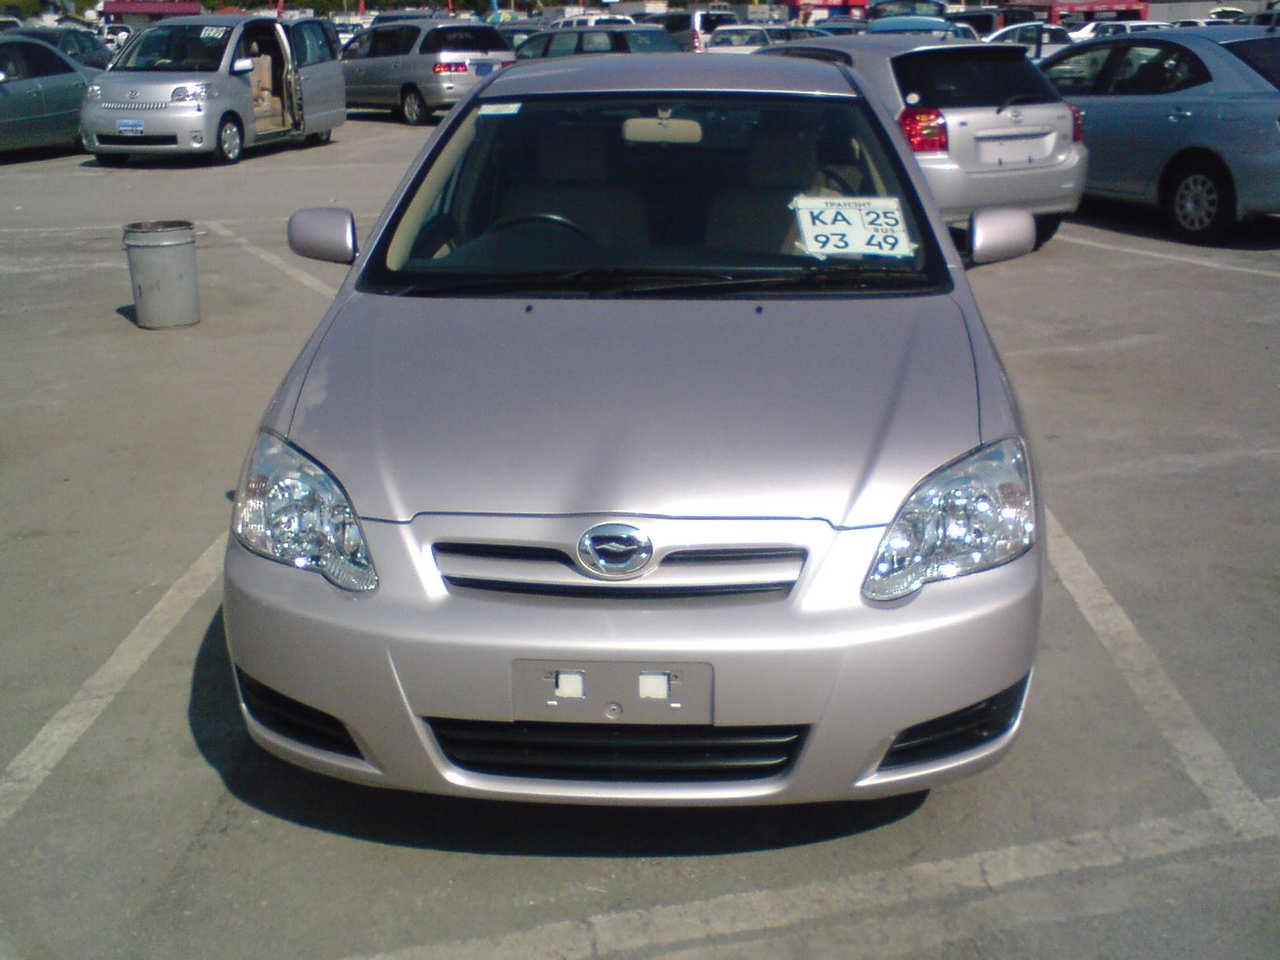 2004 Toyota Corolla Runx Photos 1 5 Gasoline Ff